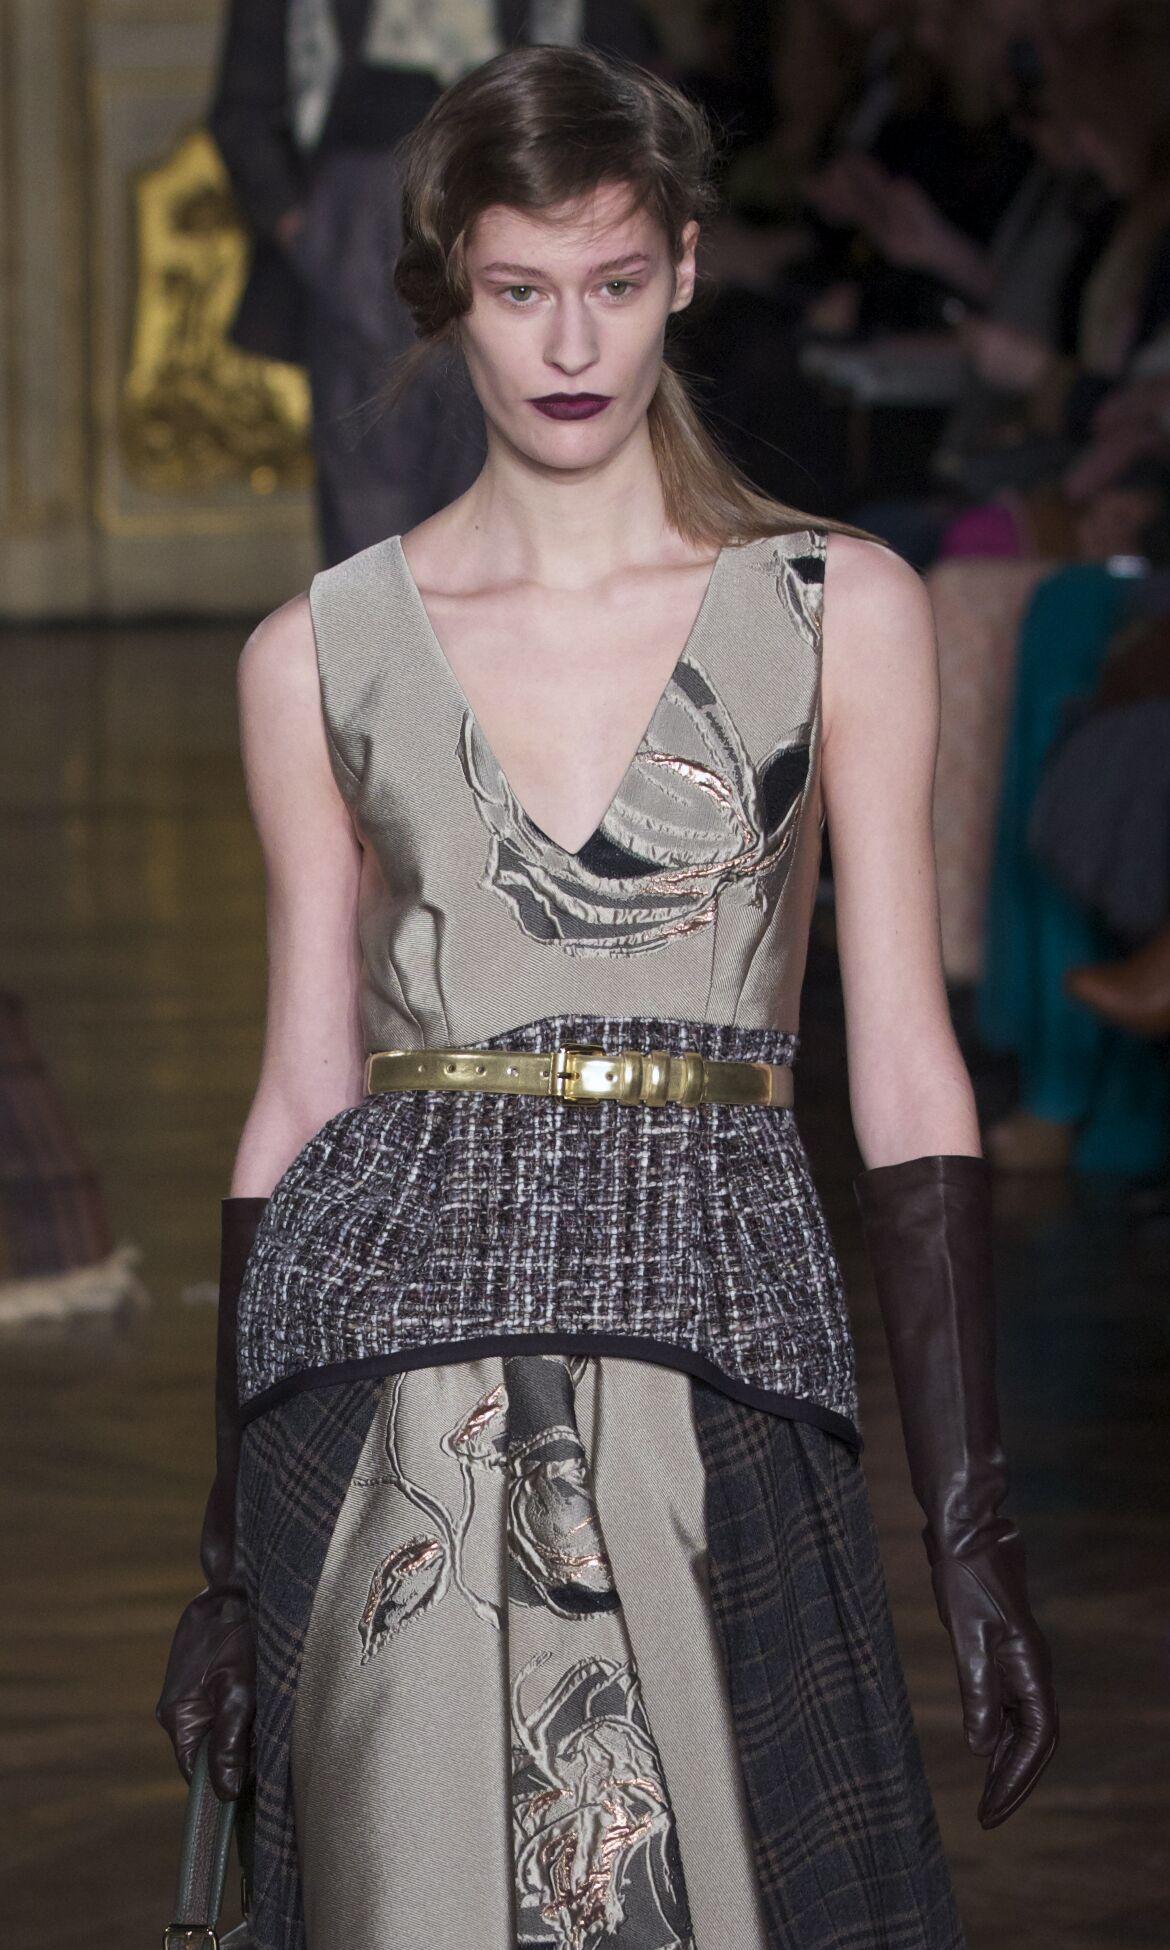 Fall Winter 2013 14 Fashion Women's Collection Antonio Marras